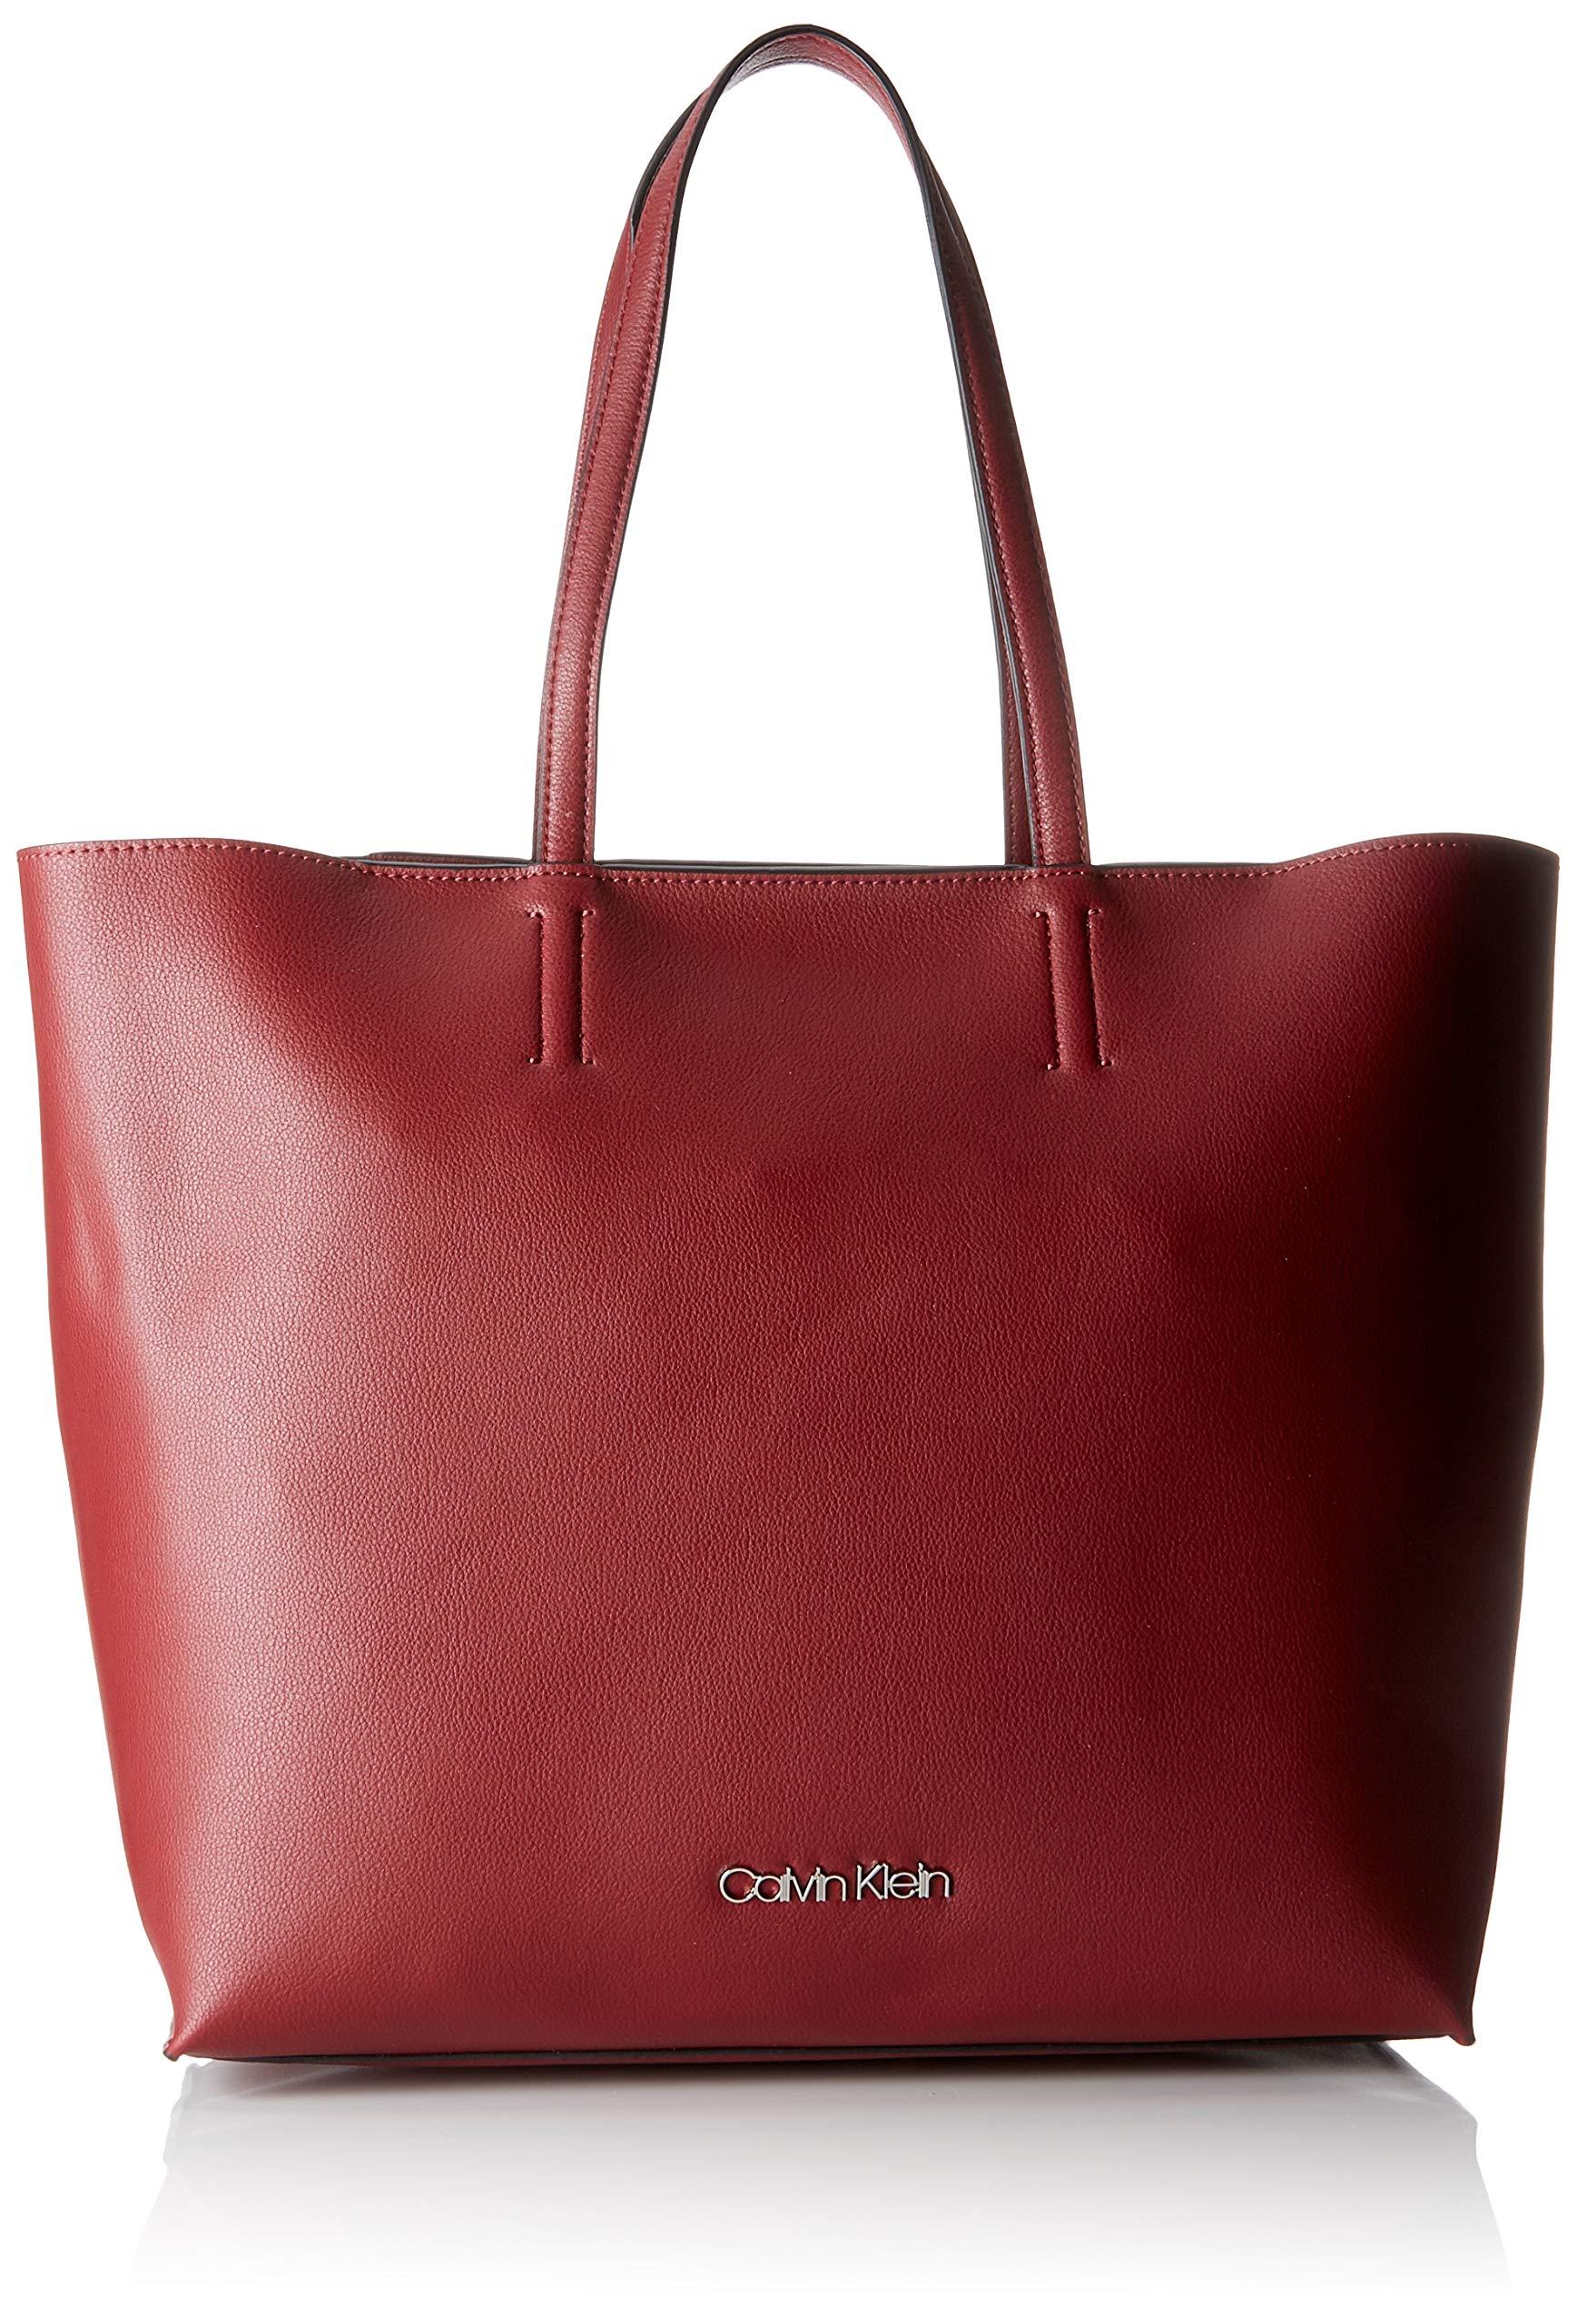 Klein Carteras Bolsos Y Mujer Tack Calvin Shopper — Totes 8nN0Owyvm